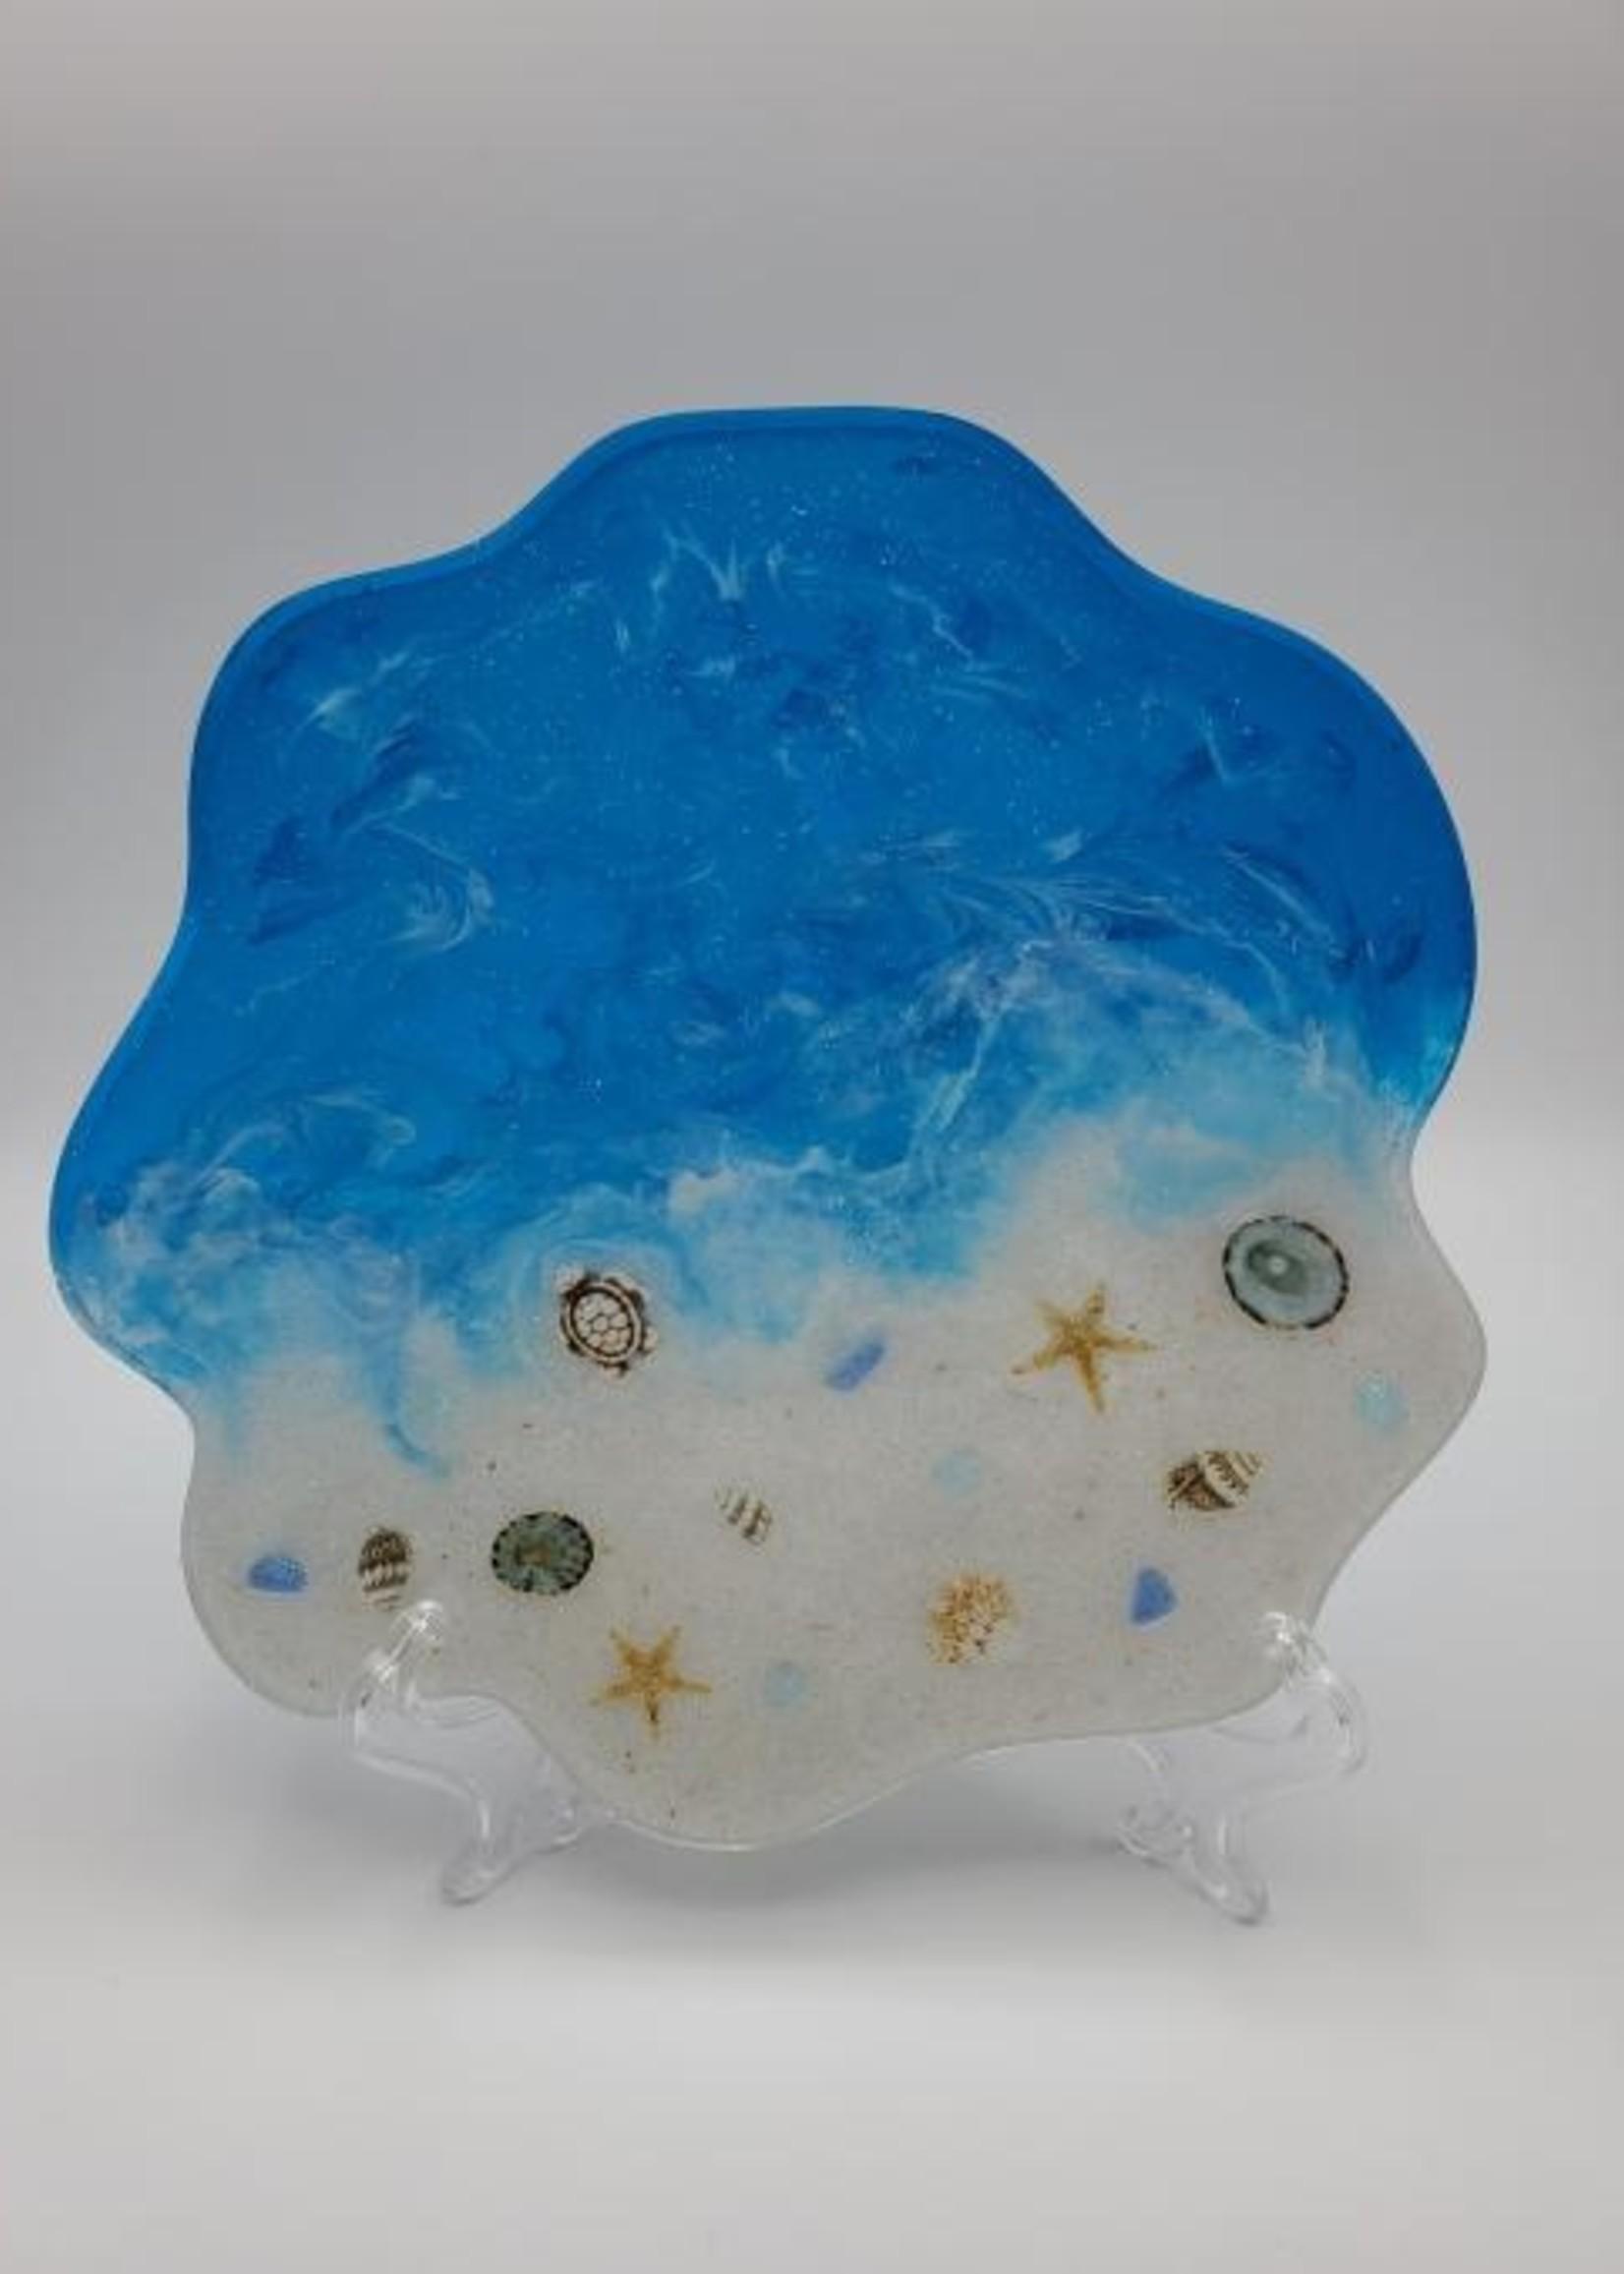 Sherri's Beachy Creations Decorative Artisan Plate Resin Art by Sherri